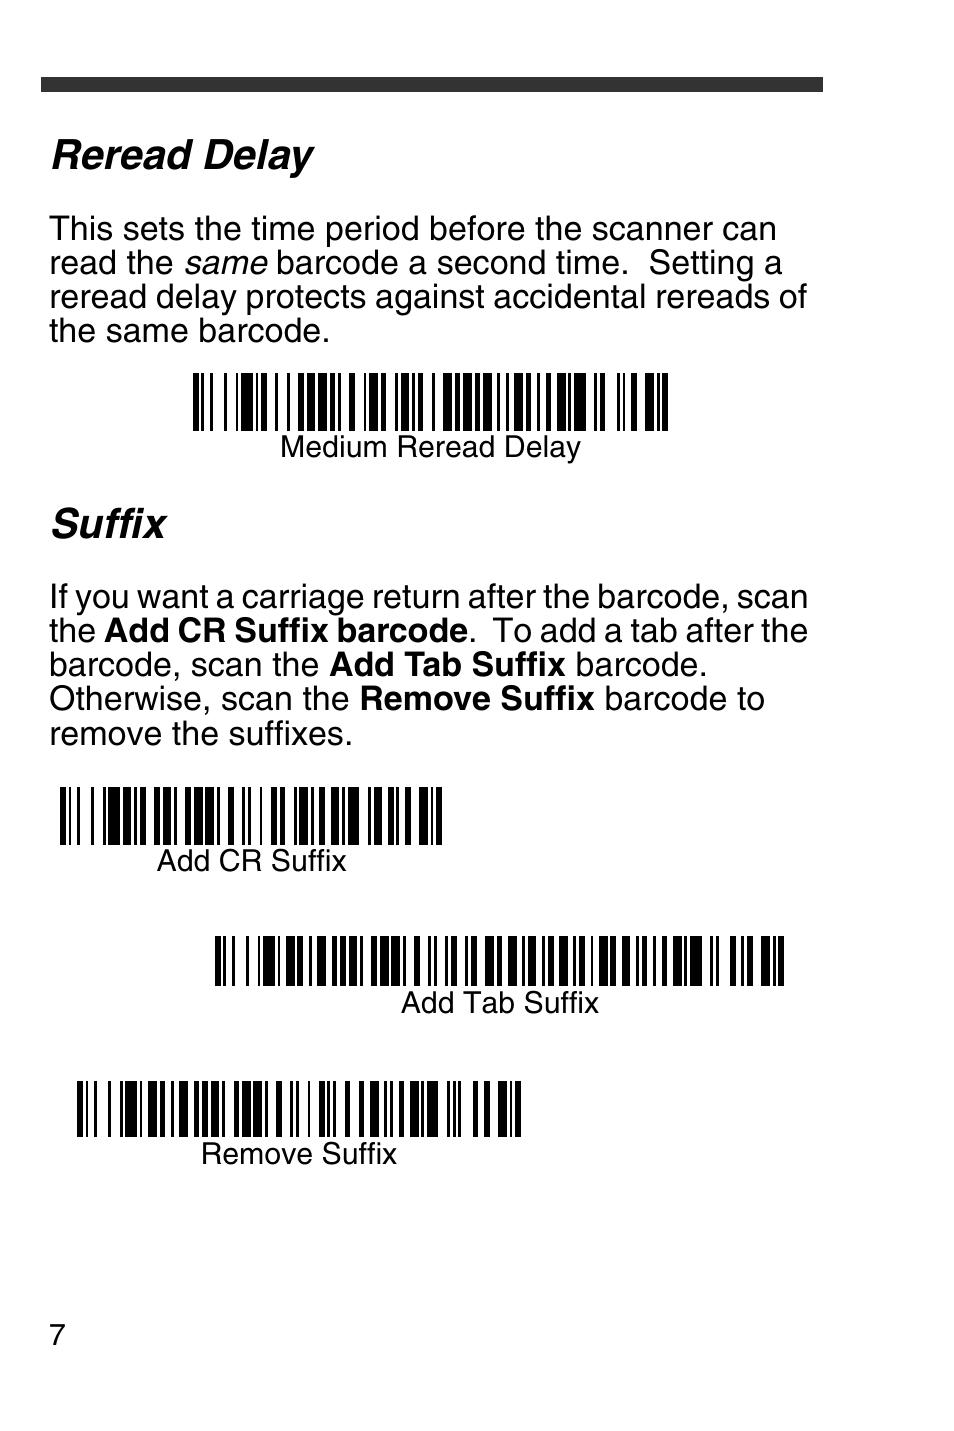 reread delay suffix honeywell 4600g user manual page 8 20 rh manualsdir com 4600G Honeywell Model Number Honeywell IT4600 Driver